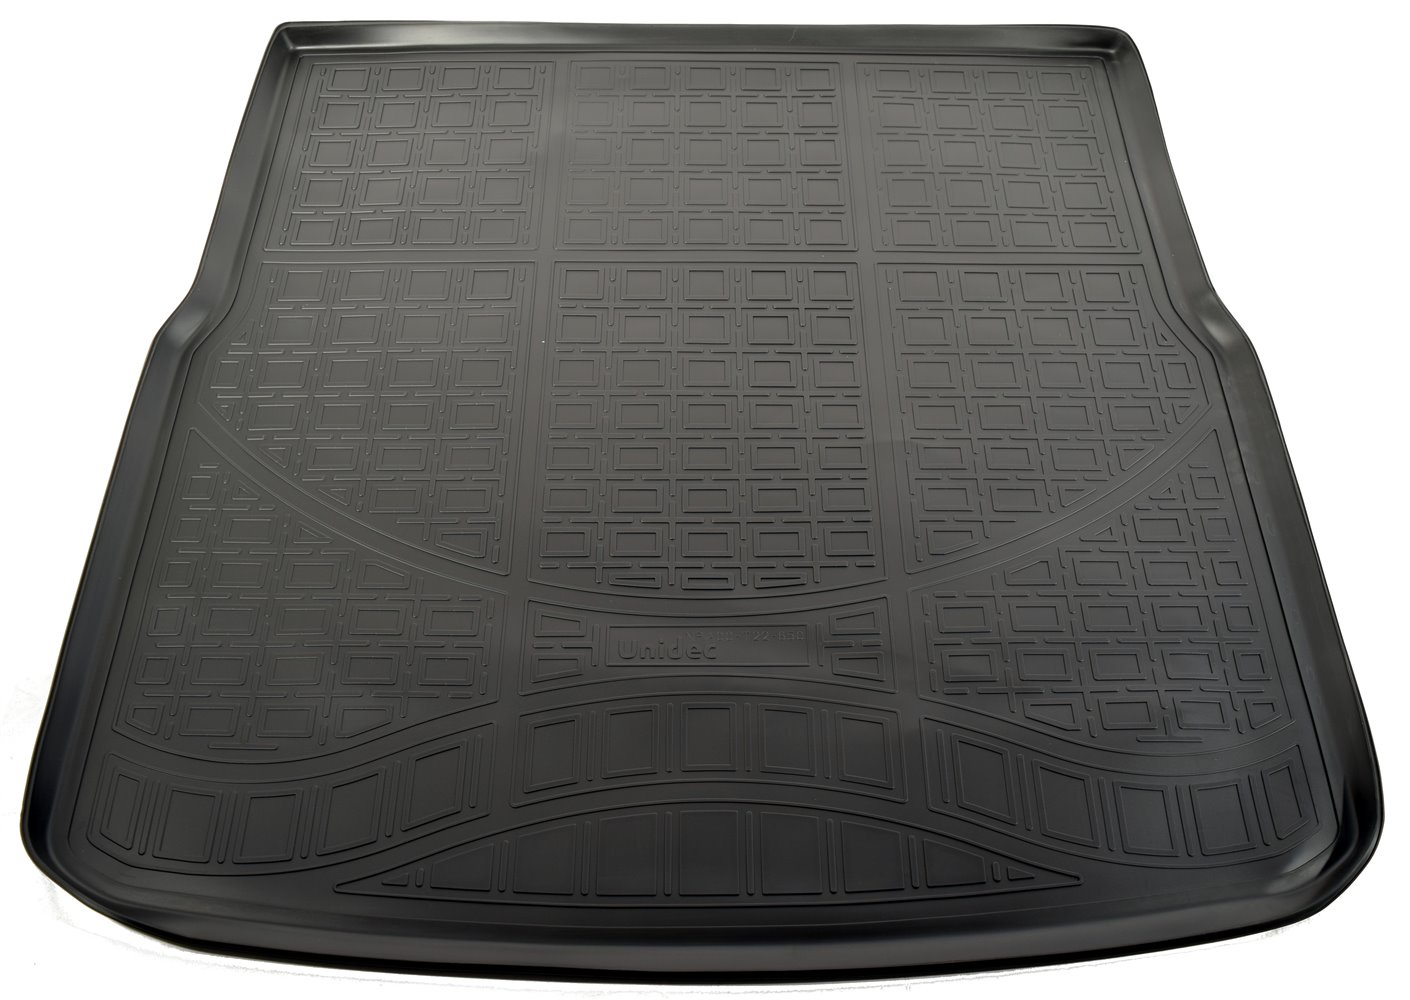 Коврик багажника Norplast для Ford Ecosport (2014-), npa00-t22-060 коврик багажника norplast для jeep grand cherokee wk 2010 npa00 t40 100 b бежевый